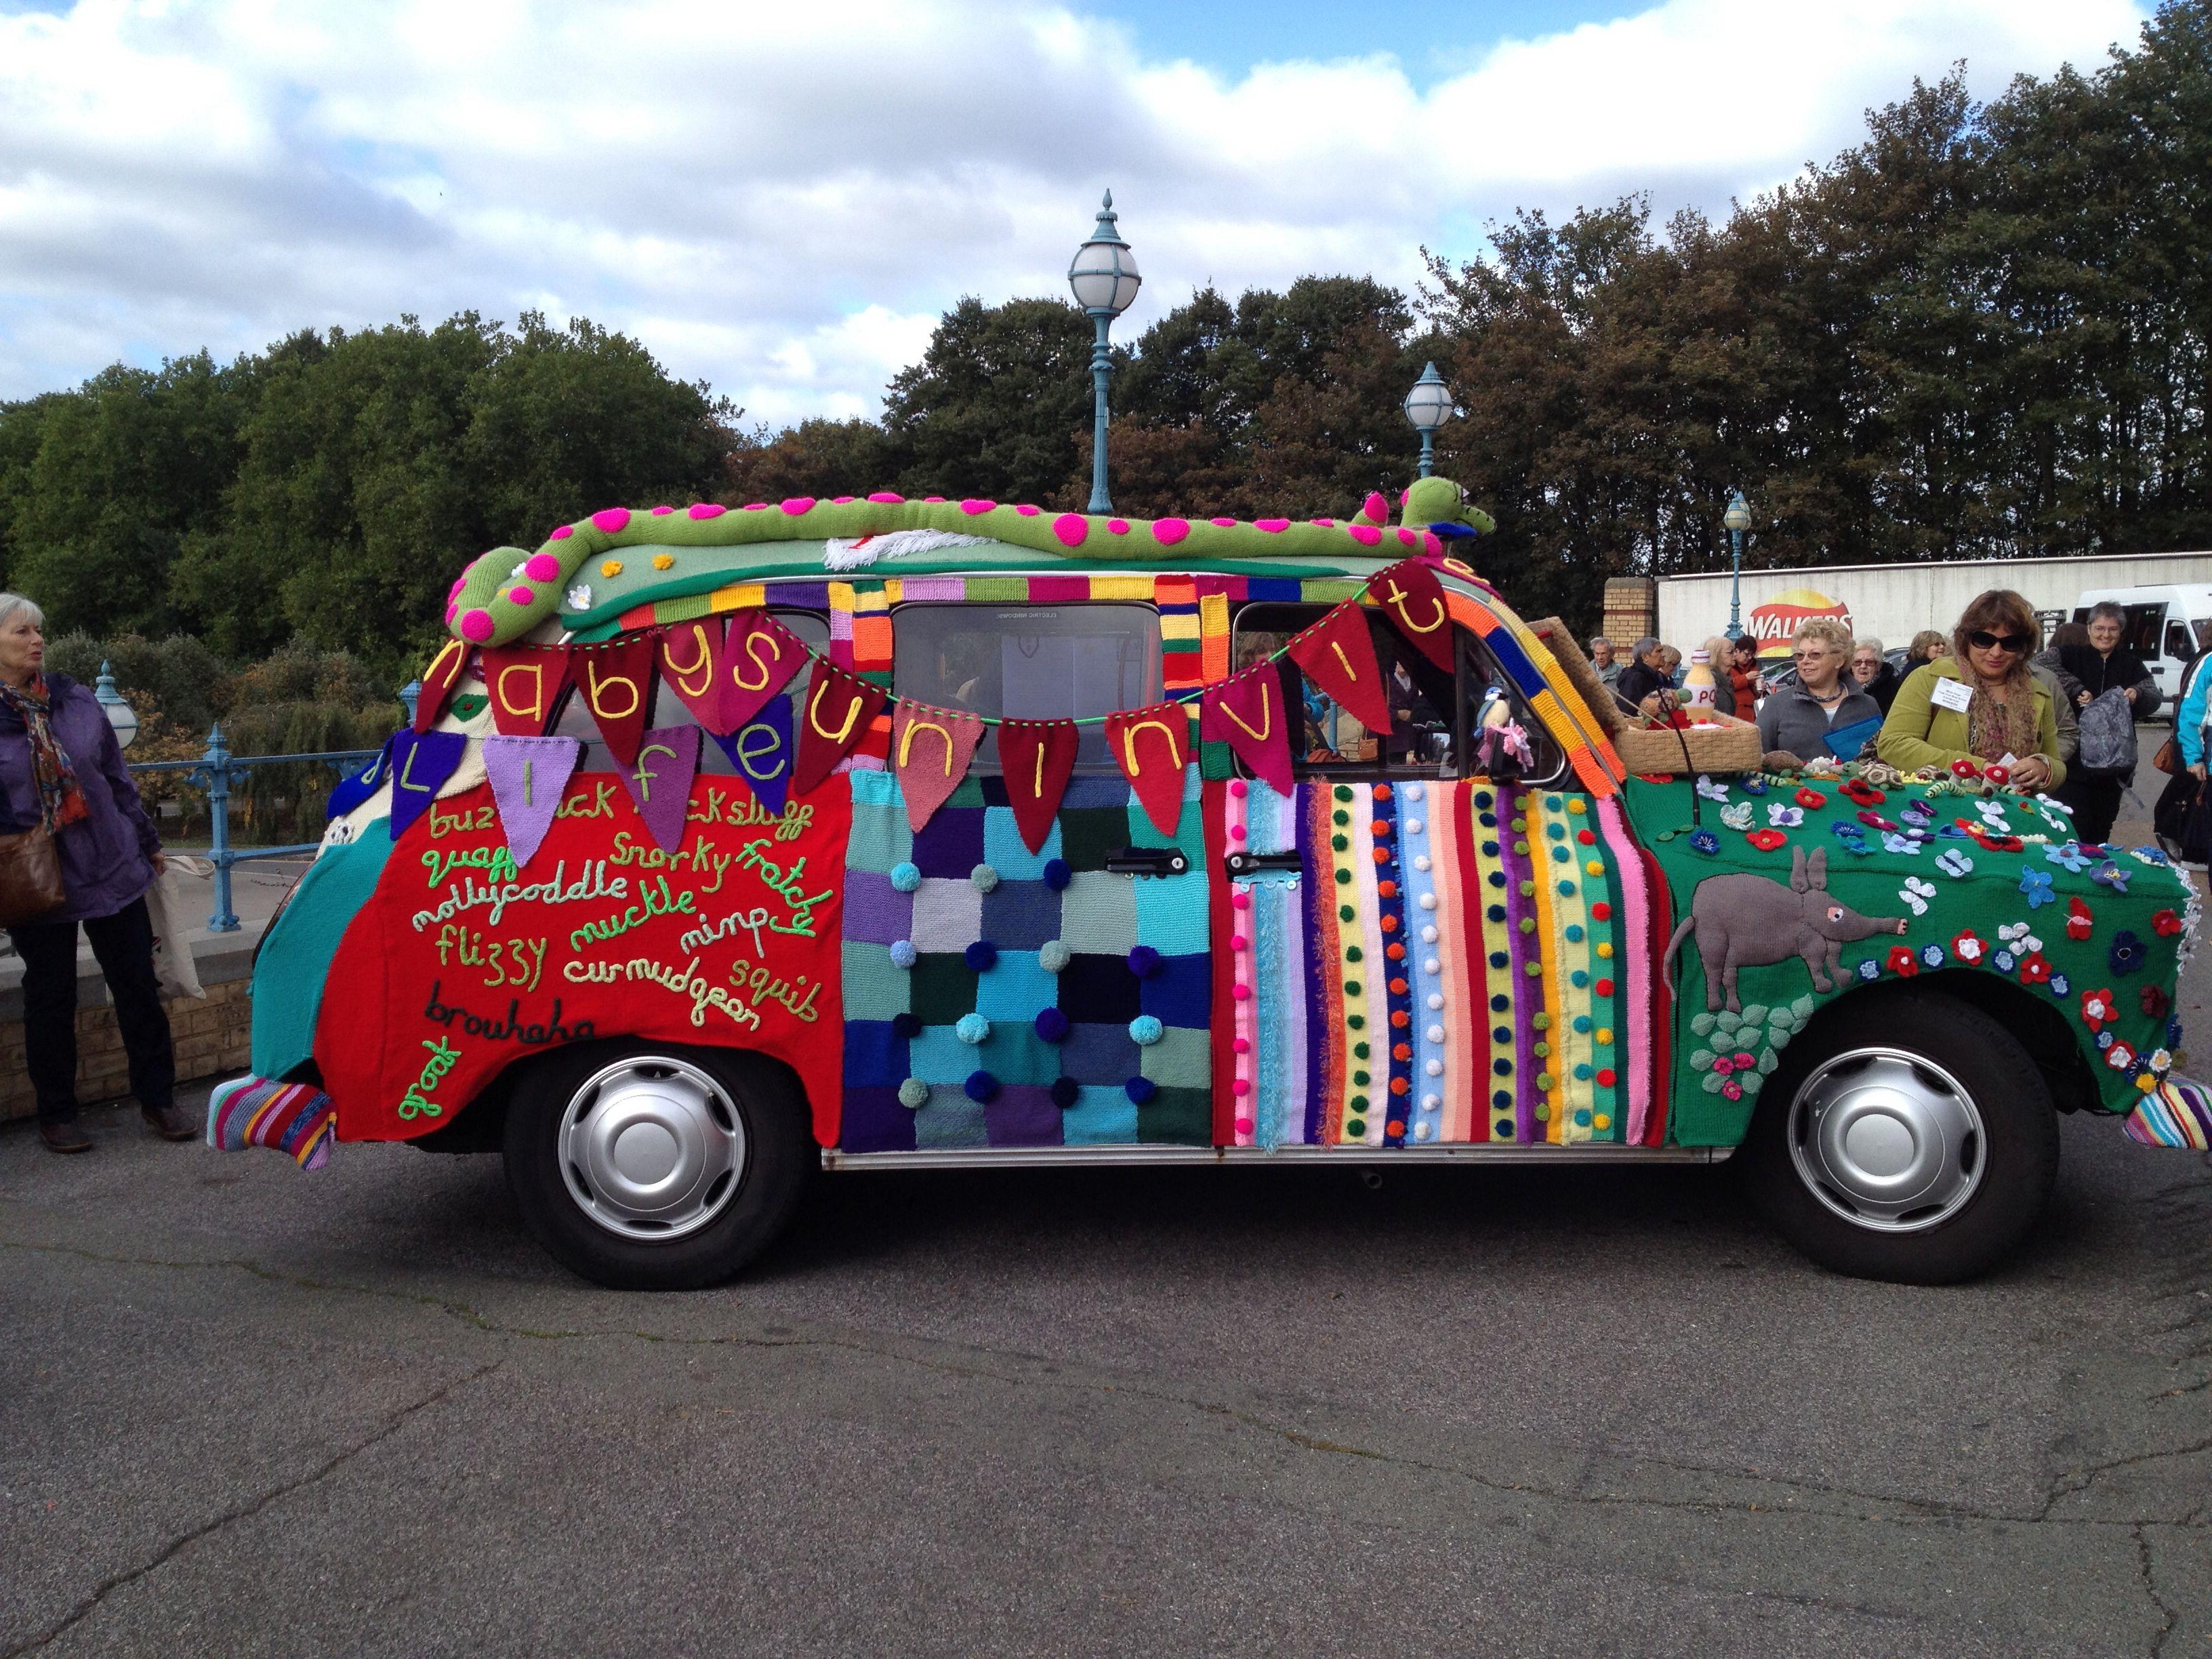 Knit and stitch show 2013